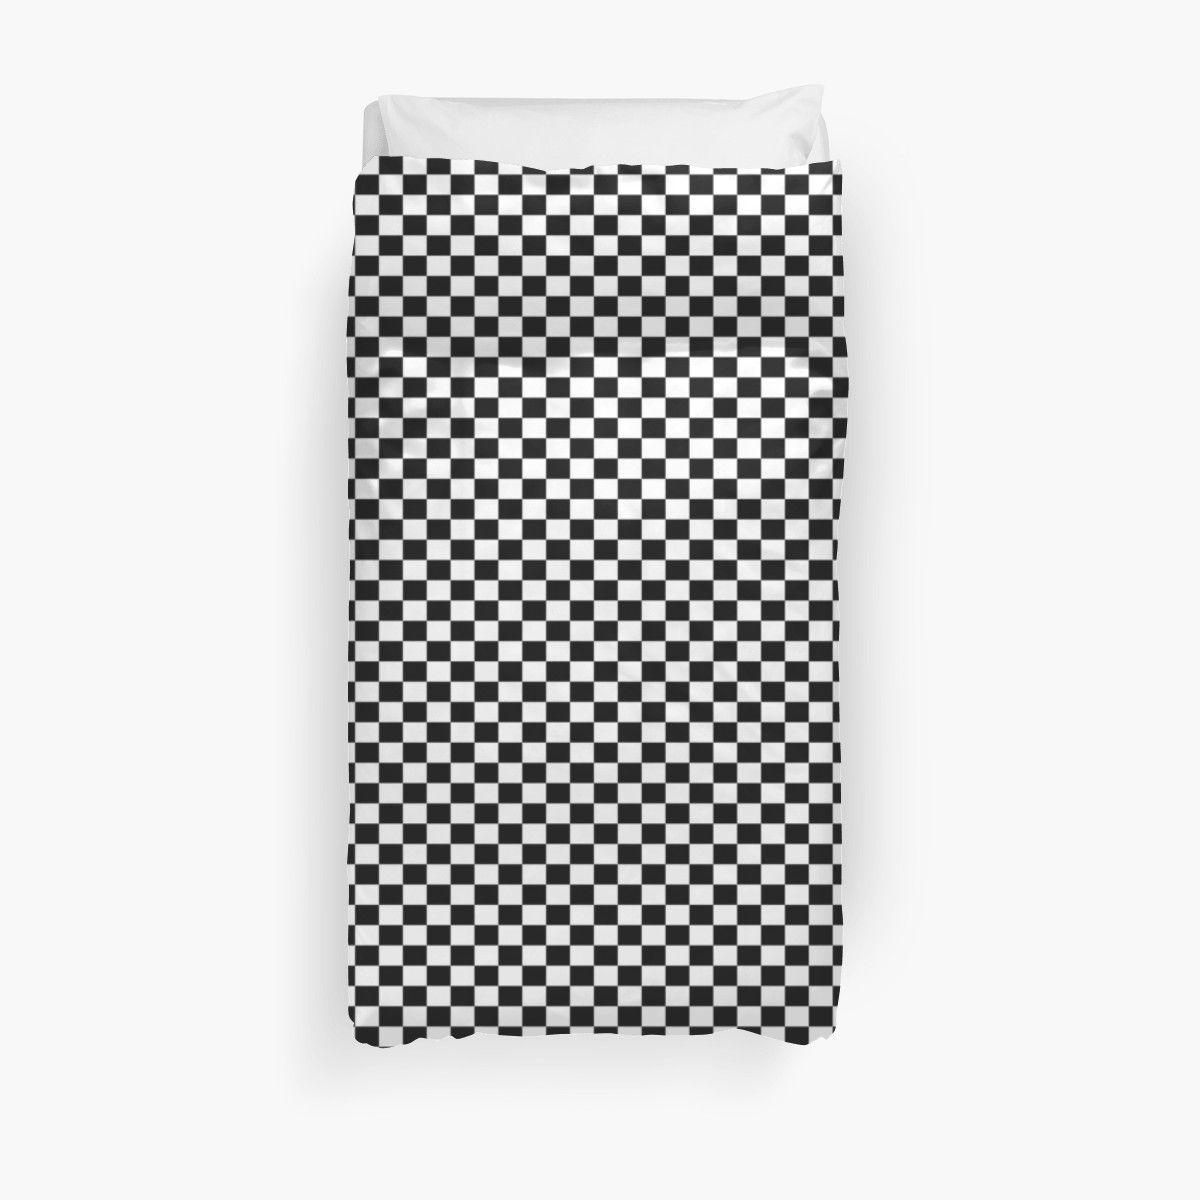 Black White Checker Design Bedspread - Mini Chess Sticker Duvet Cover images